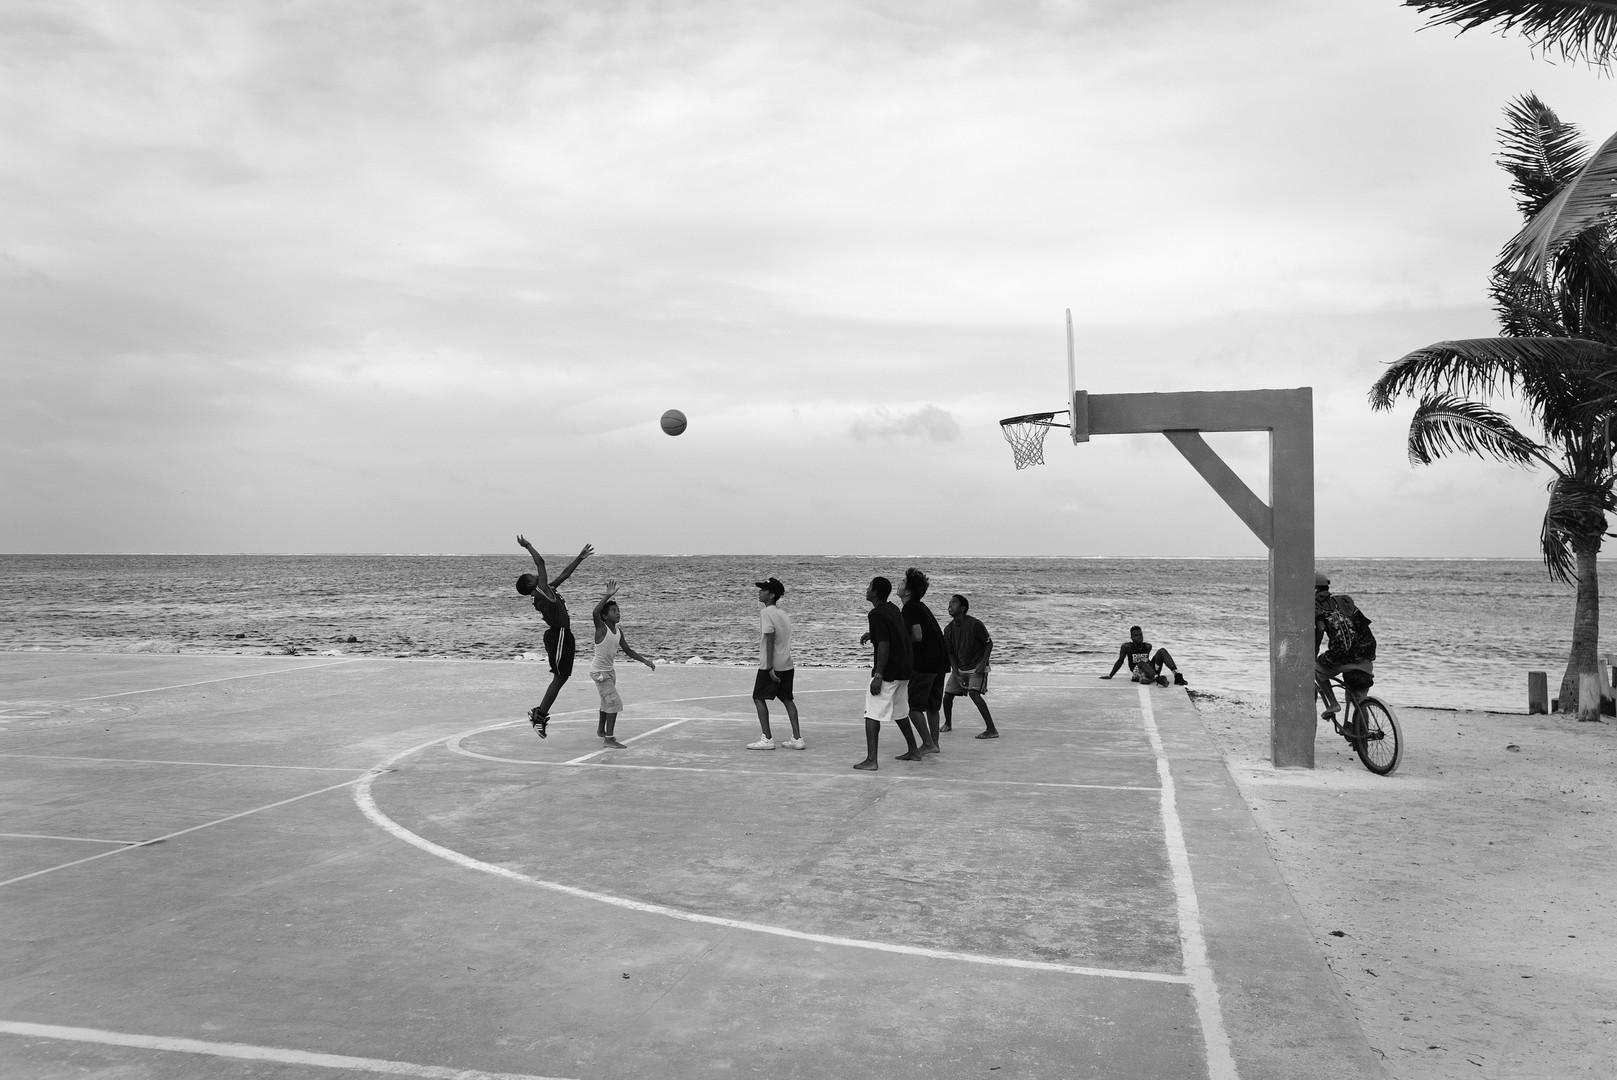 belize_basketball_bw.jpg